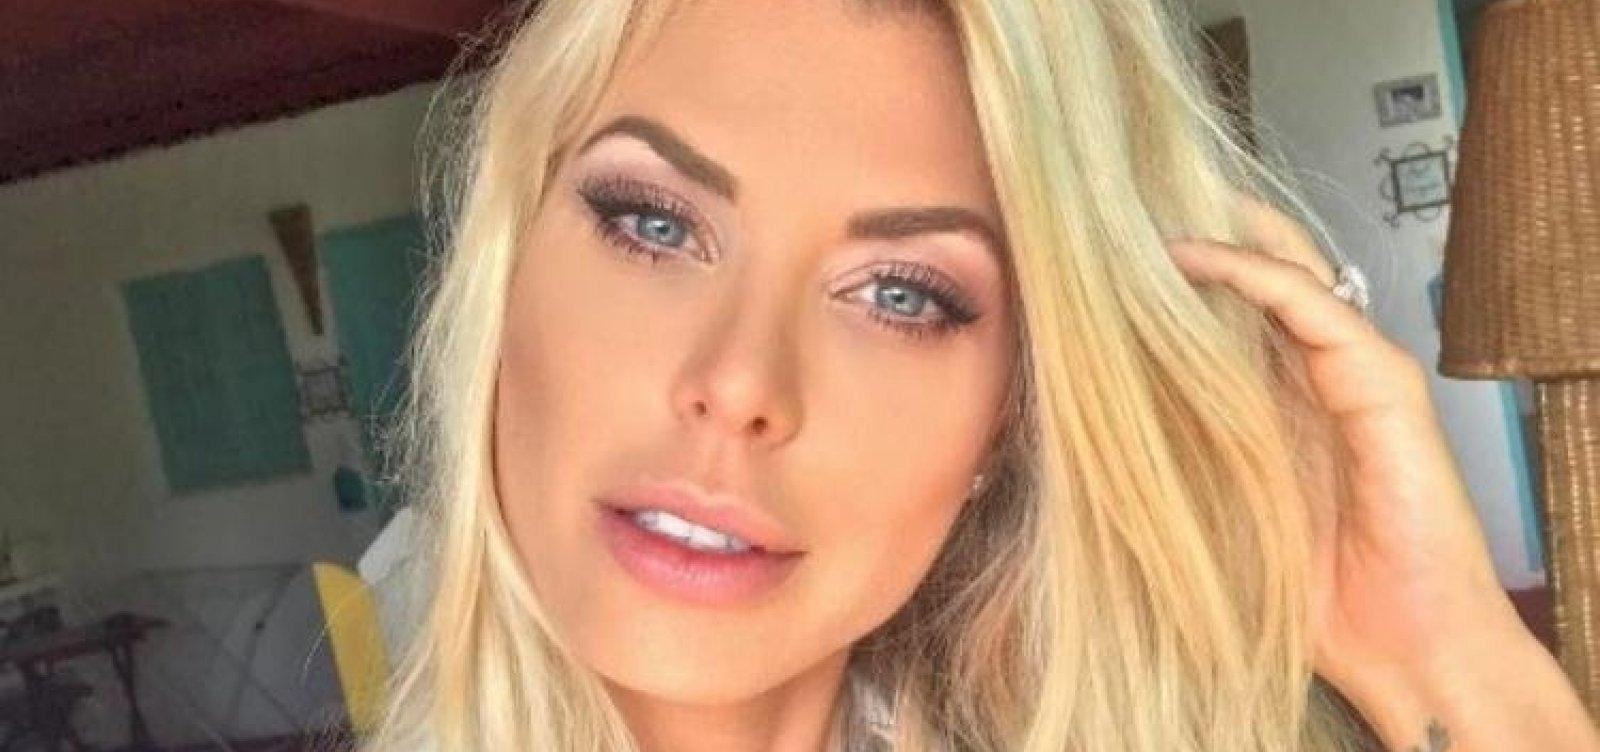 [Viúvo da modelo Caroline Bittencourt será indiciado por homicídio culposo]